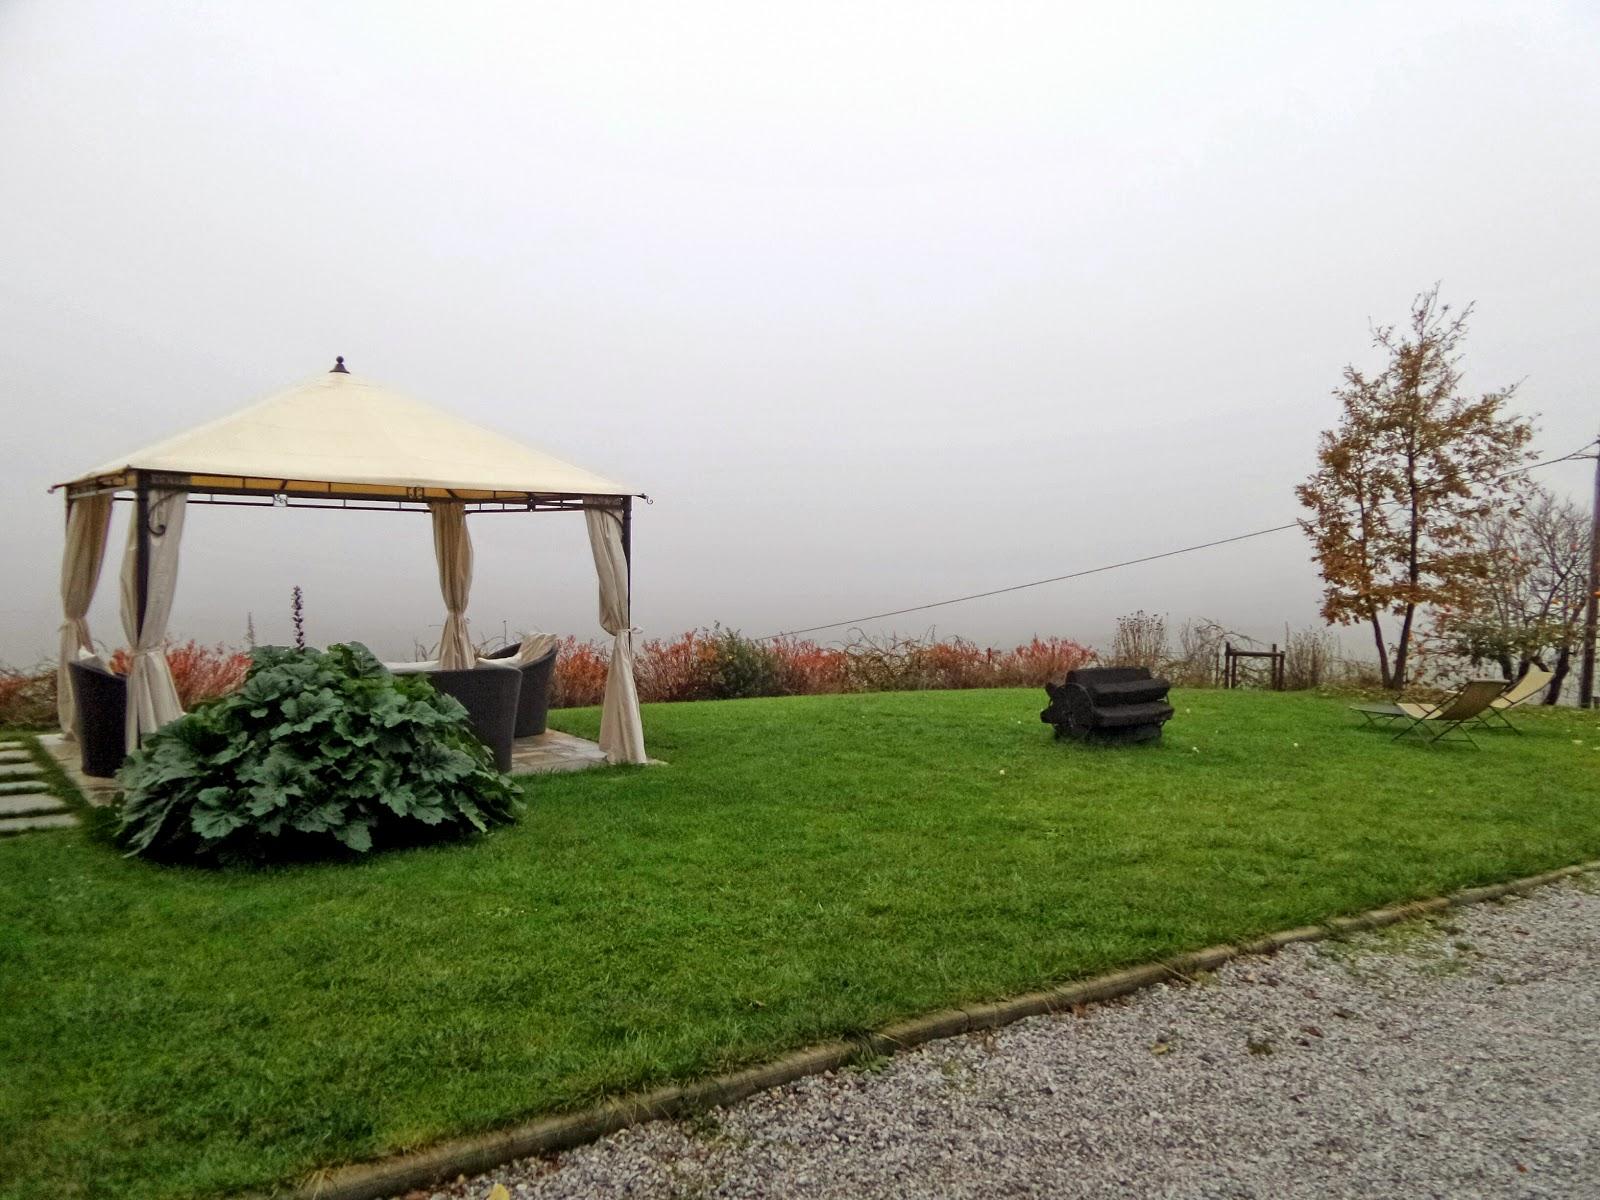 Bricco Torricella - Monforte d'Alba